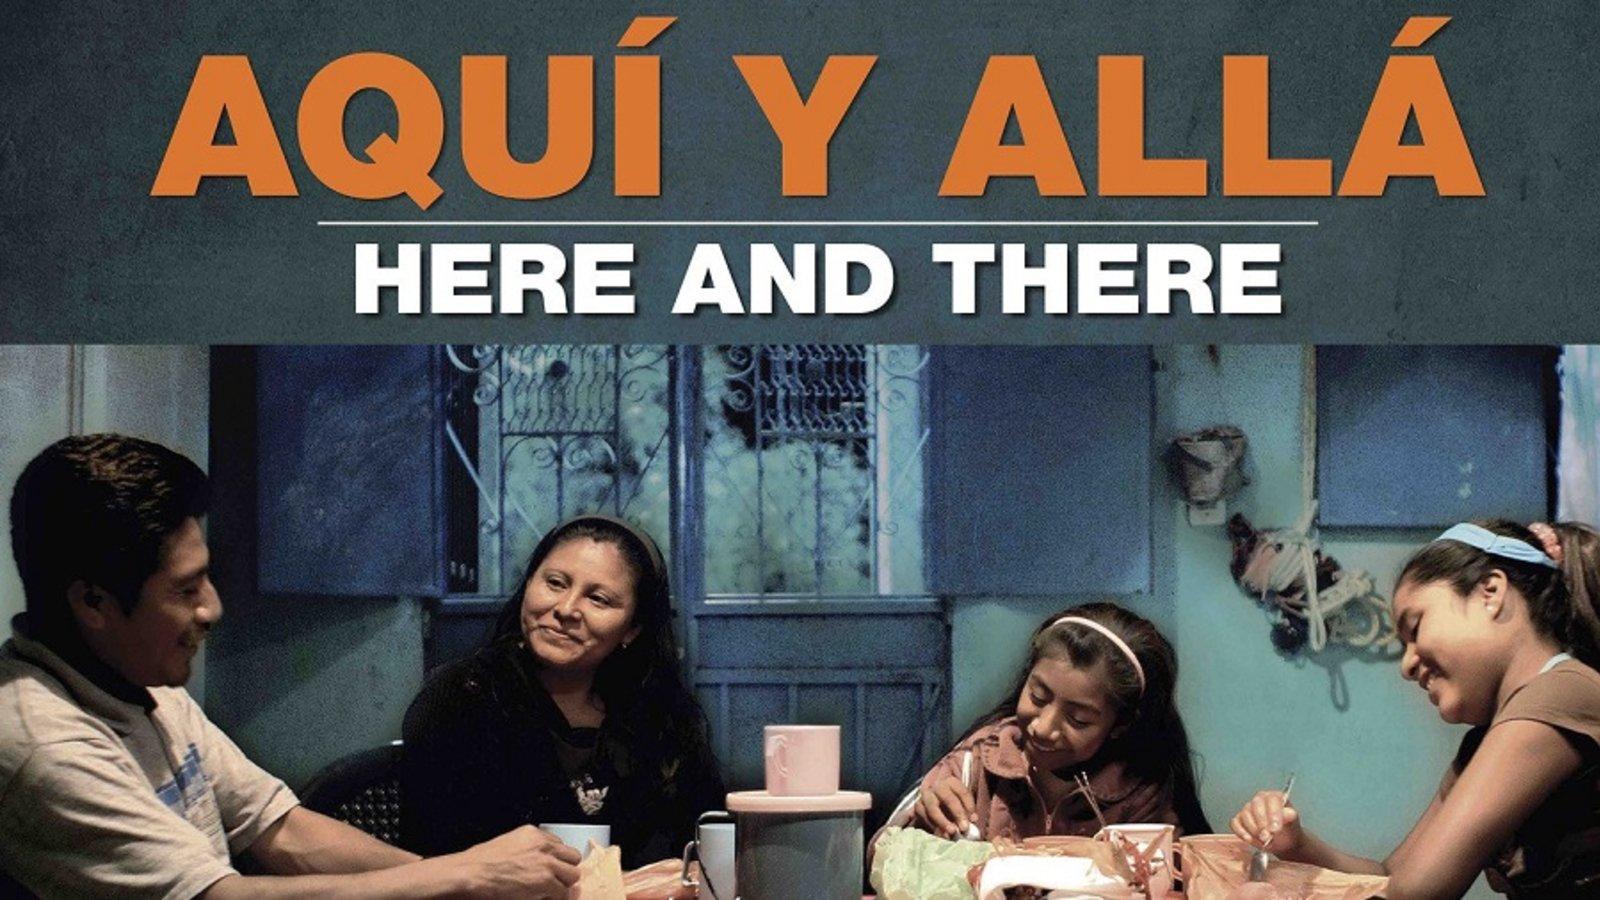 Here and There - Aqui y Alla